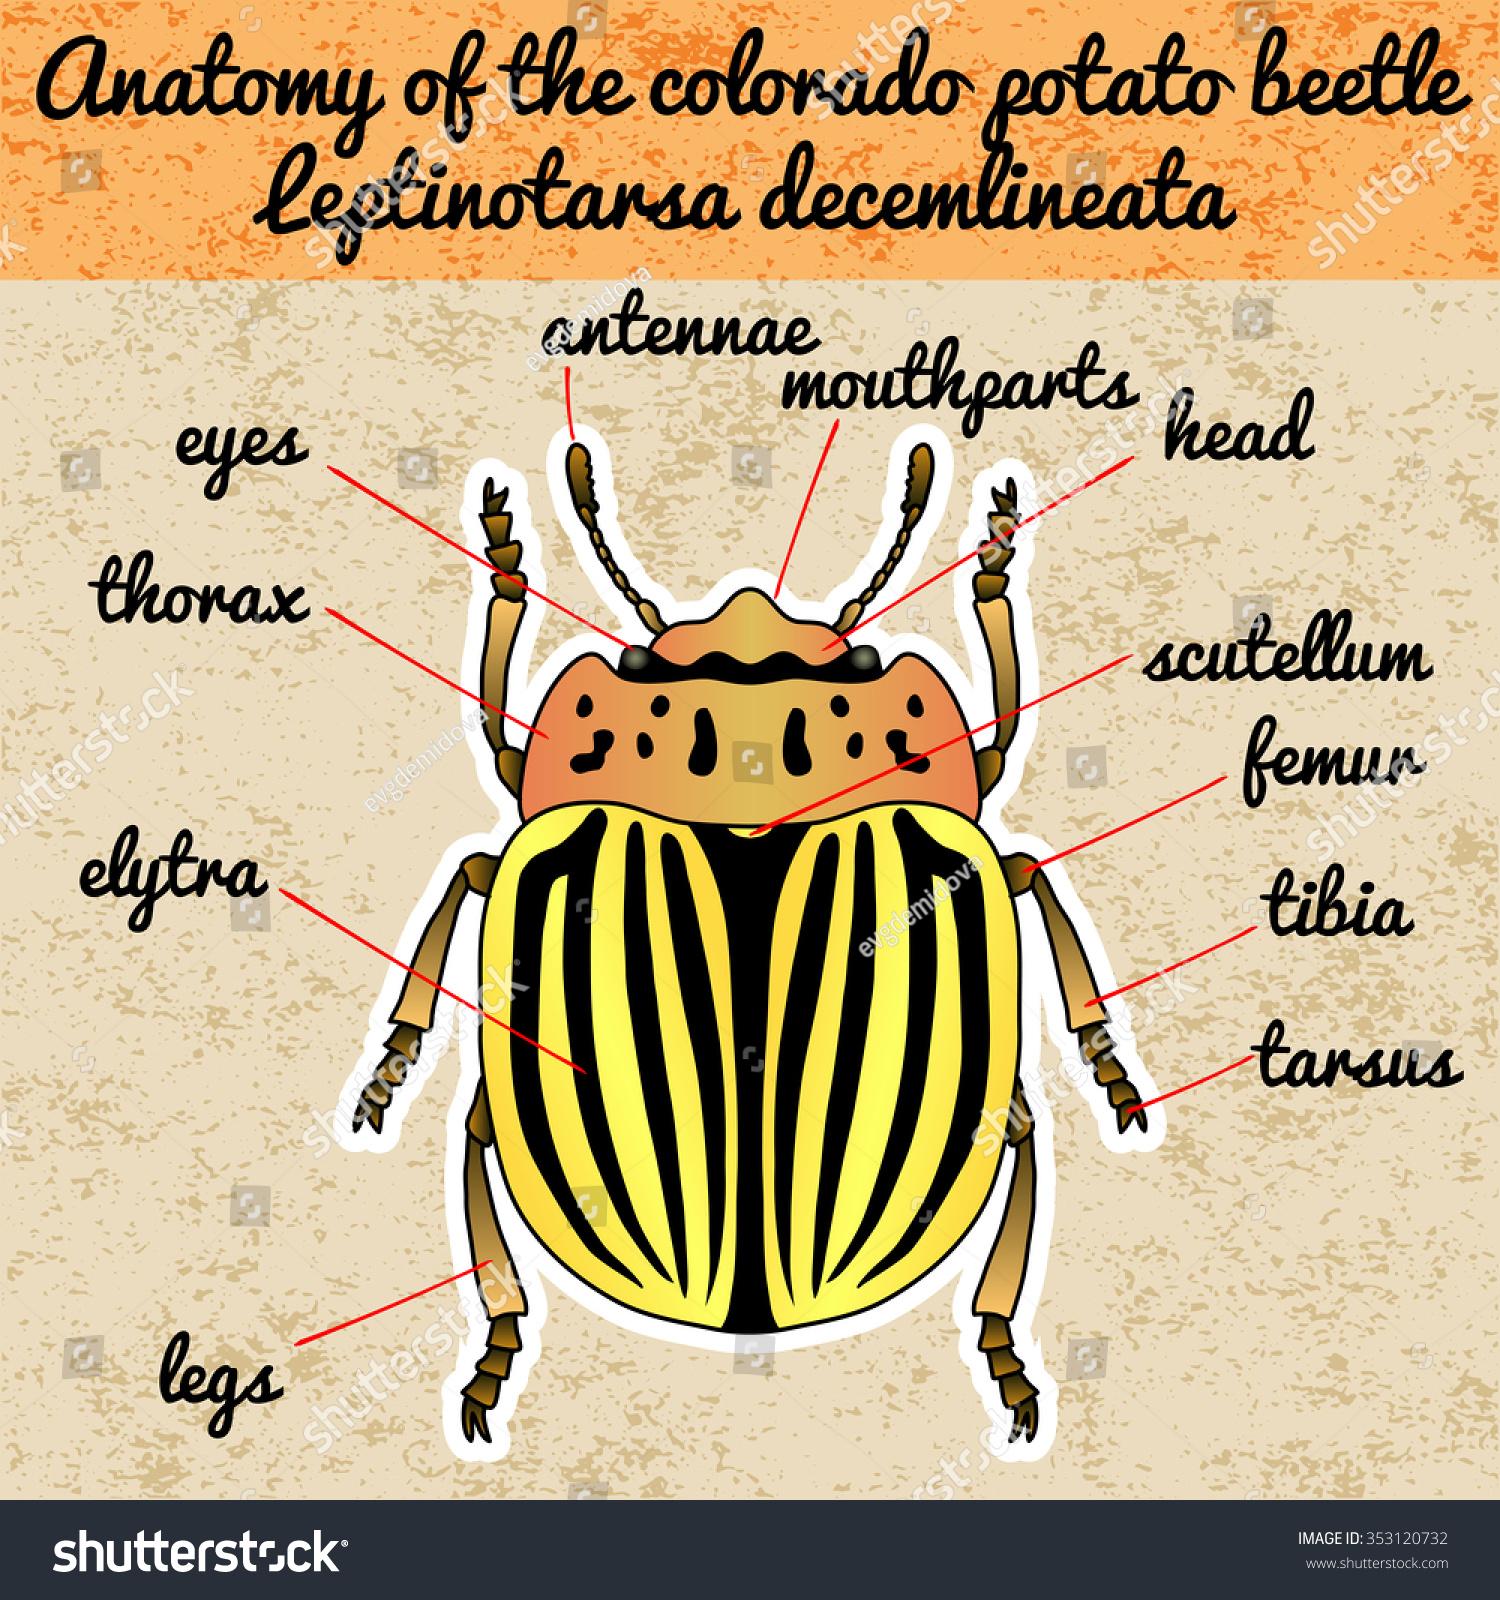 Insect Anatomy Sticker Colorado Potato Beetle Stock Photo (Photo ...